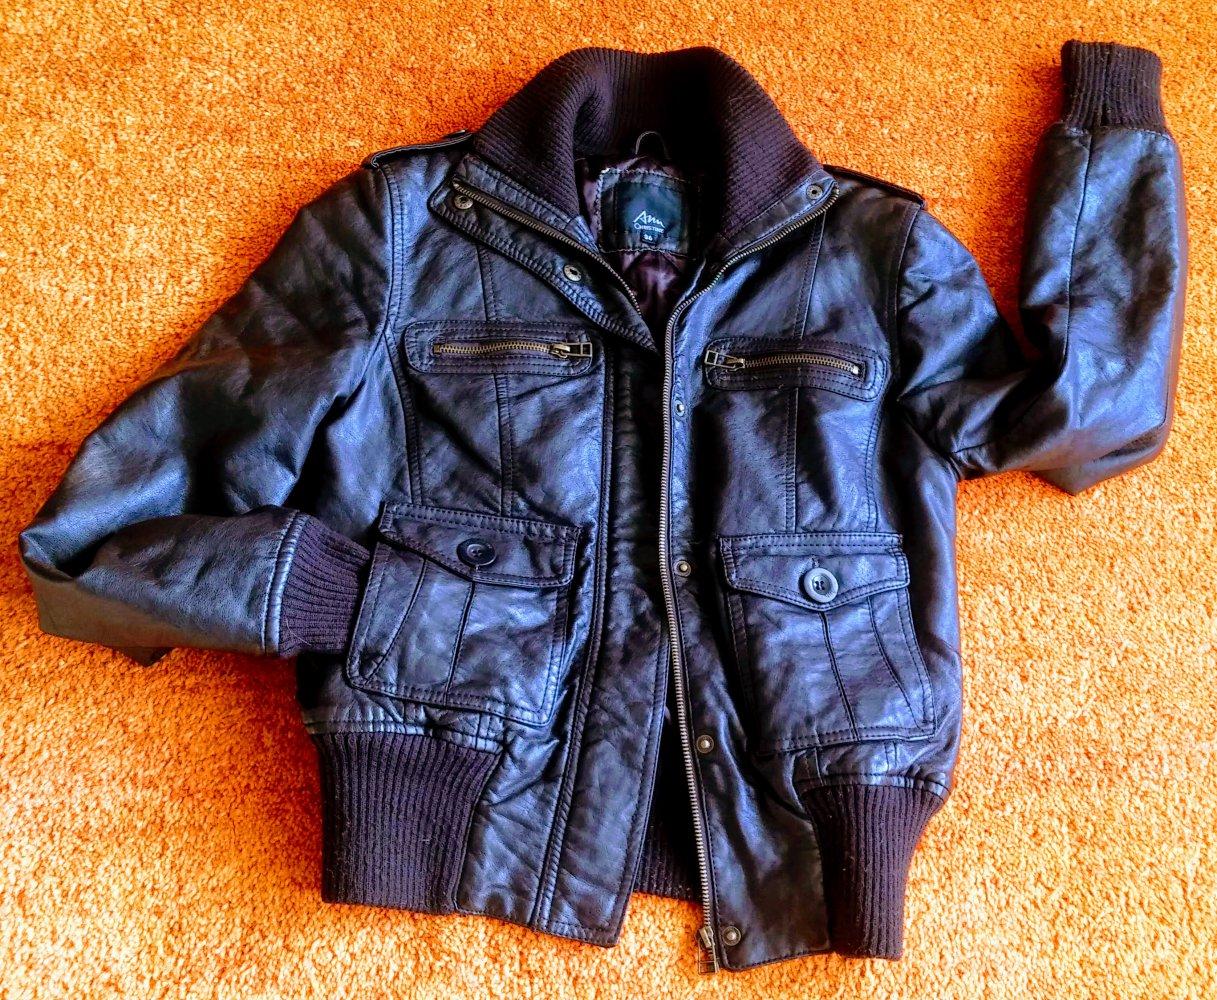 7d9804fcb5d5 ... Damen Jacke LederImitat Gr.36 in Braun von Ann Christine .